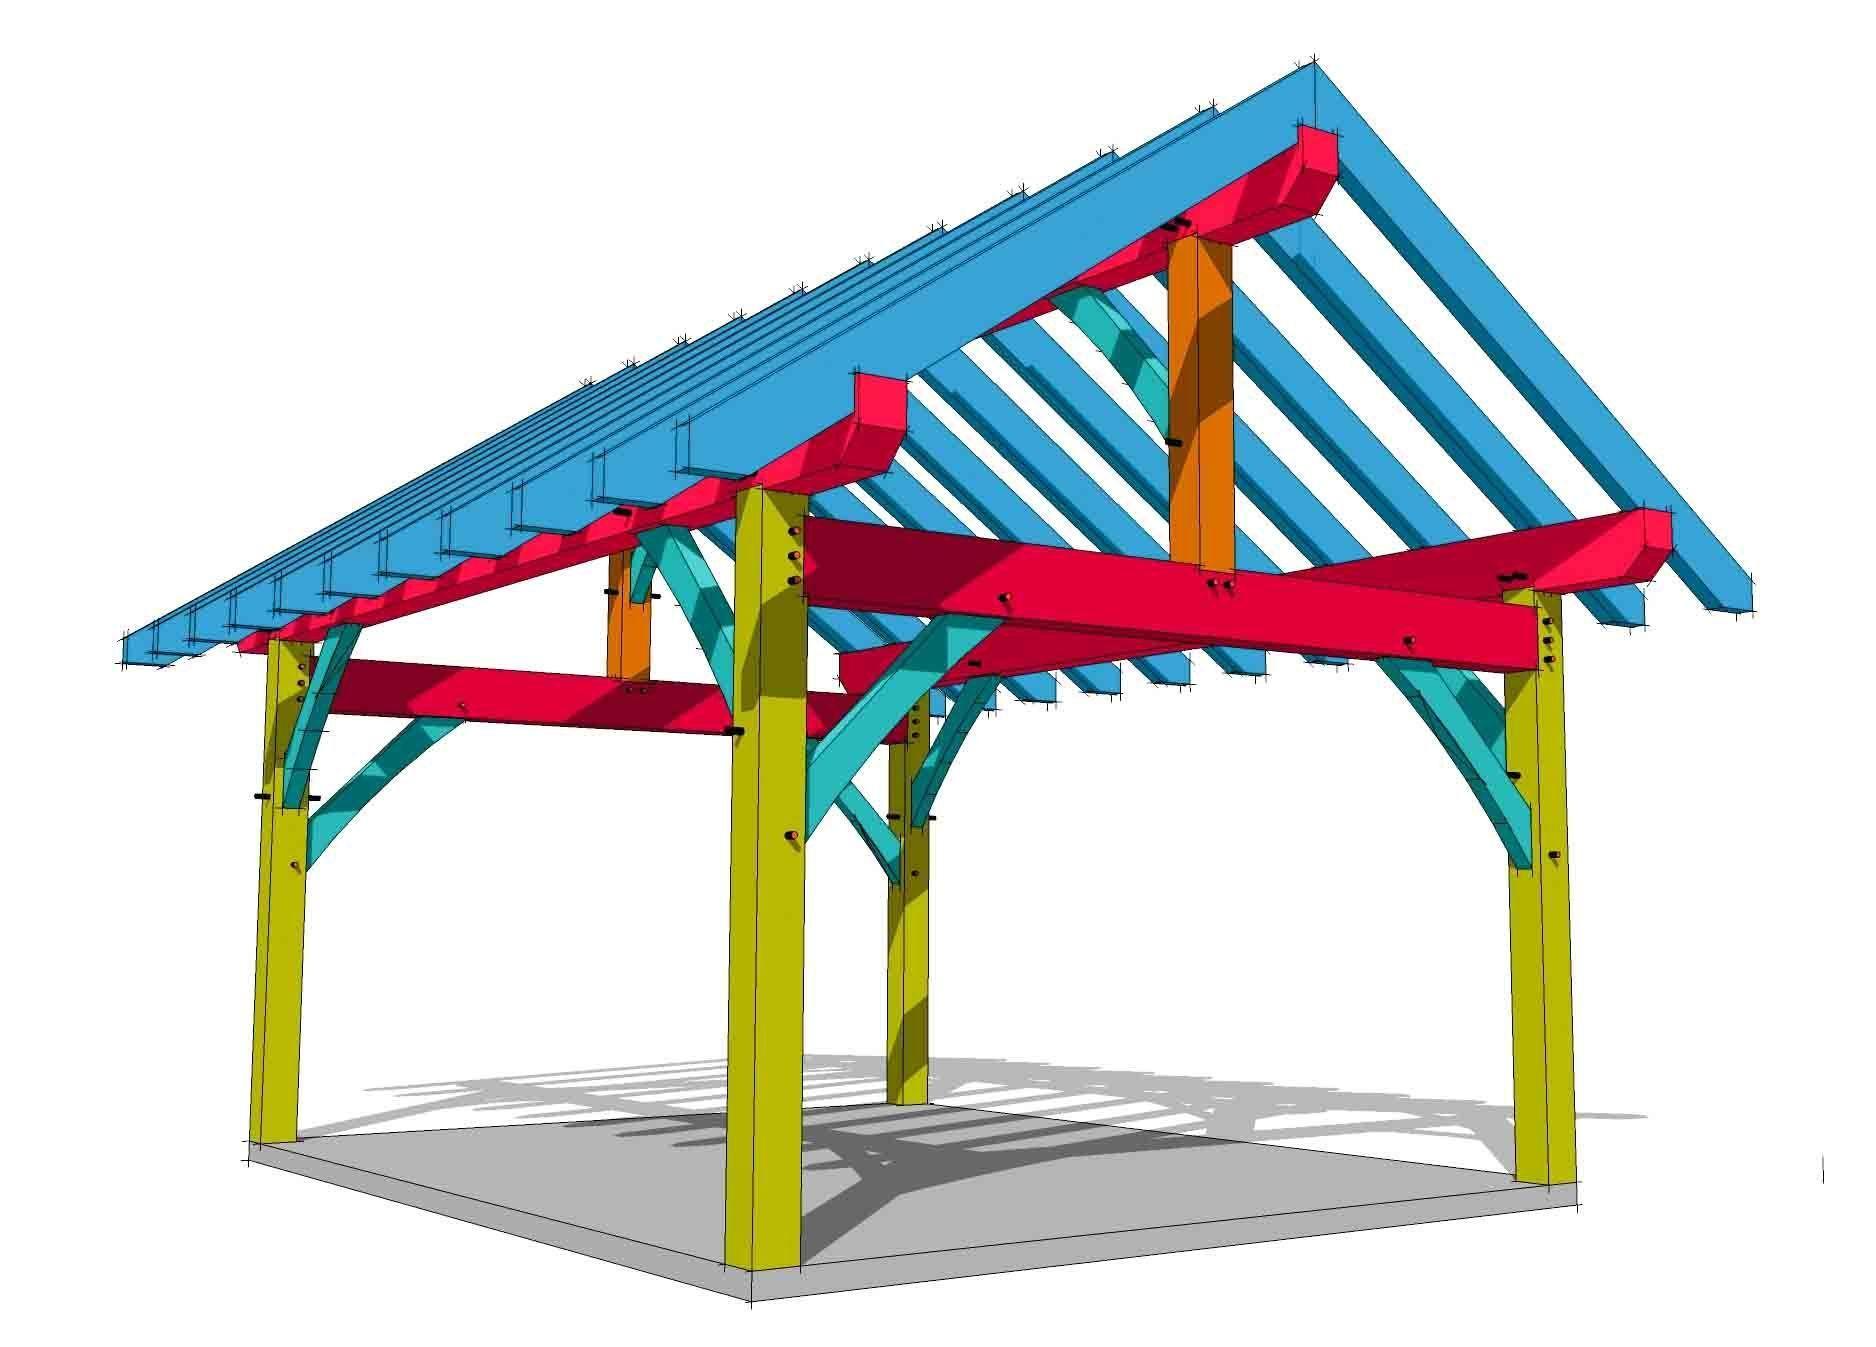 14x18 King Post Timber frame plans, Timber frame, Shed plans